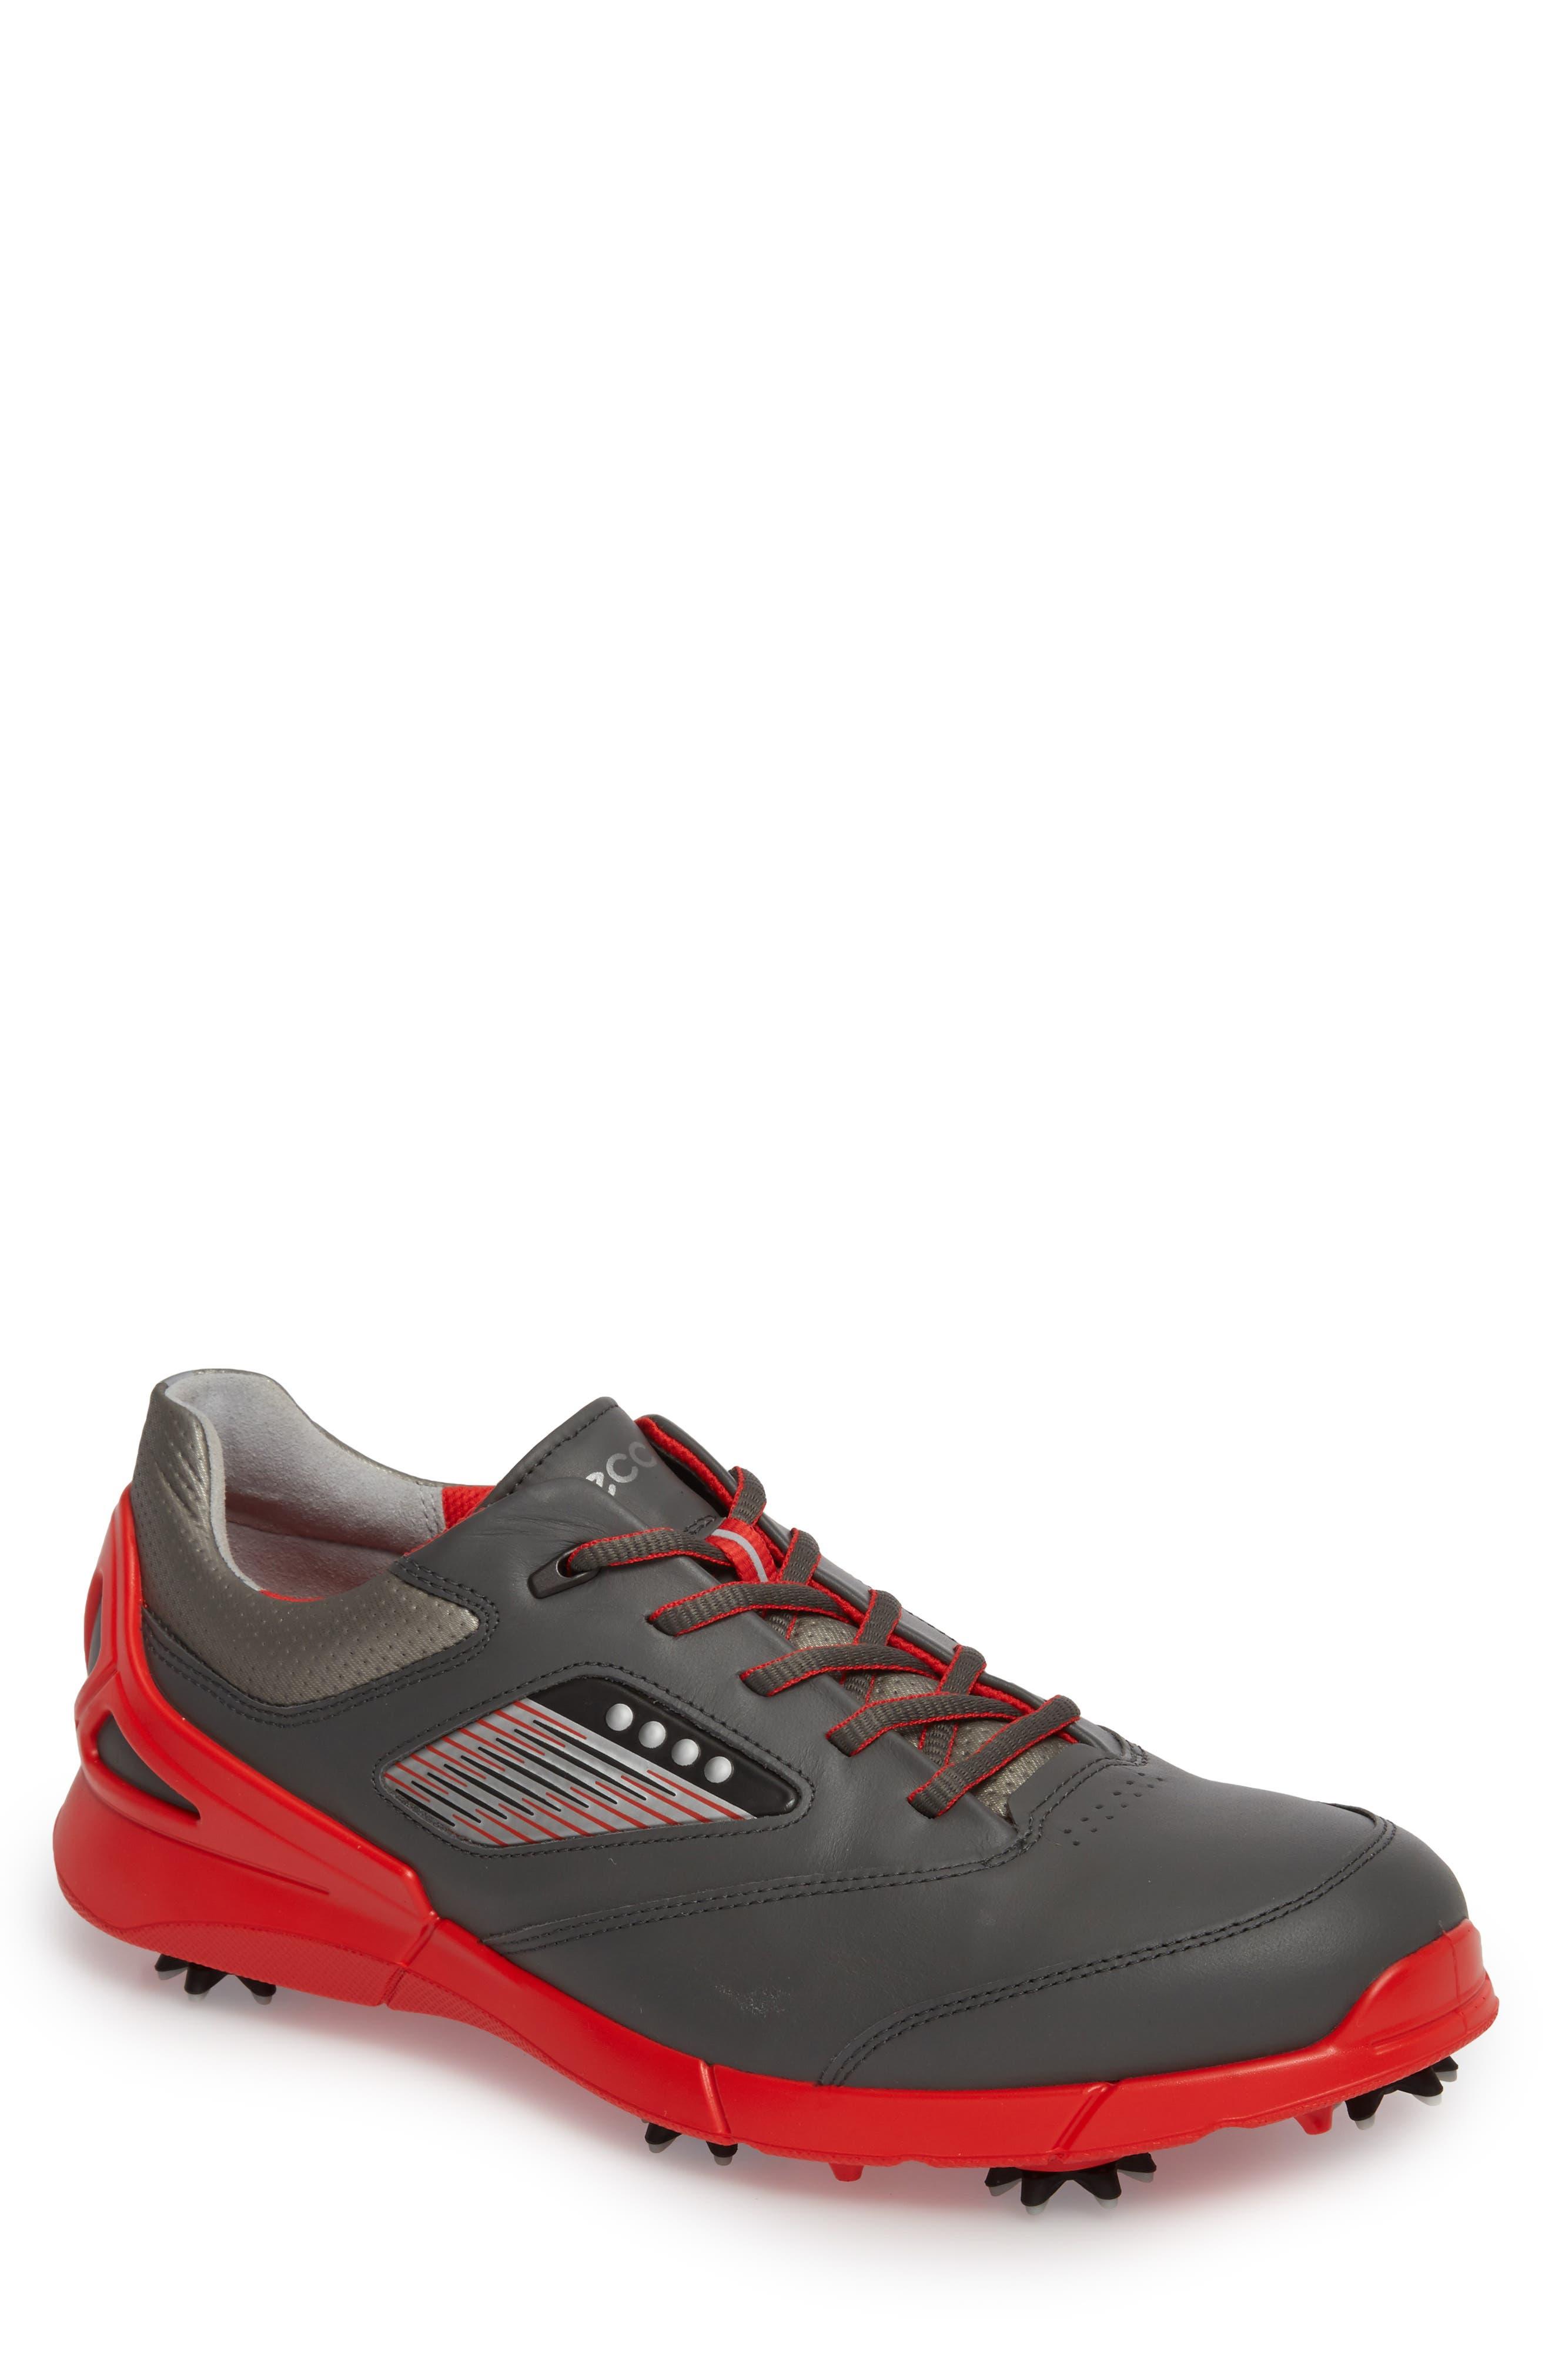 Base One Golf Shoe,                         Main,                         color, Black/ Scarlet Leather